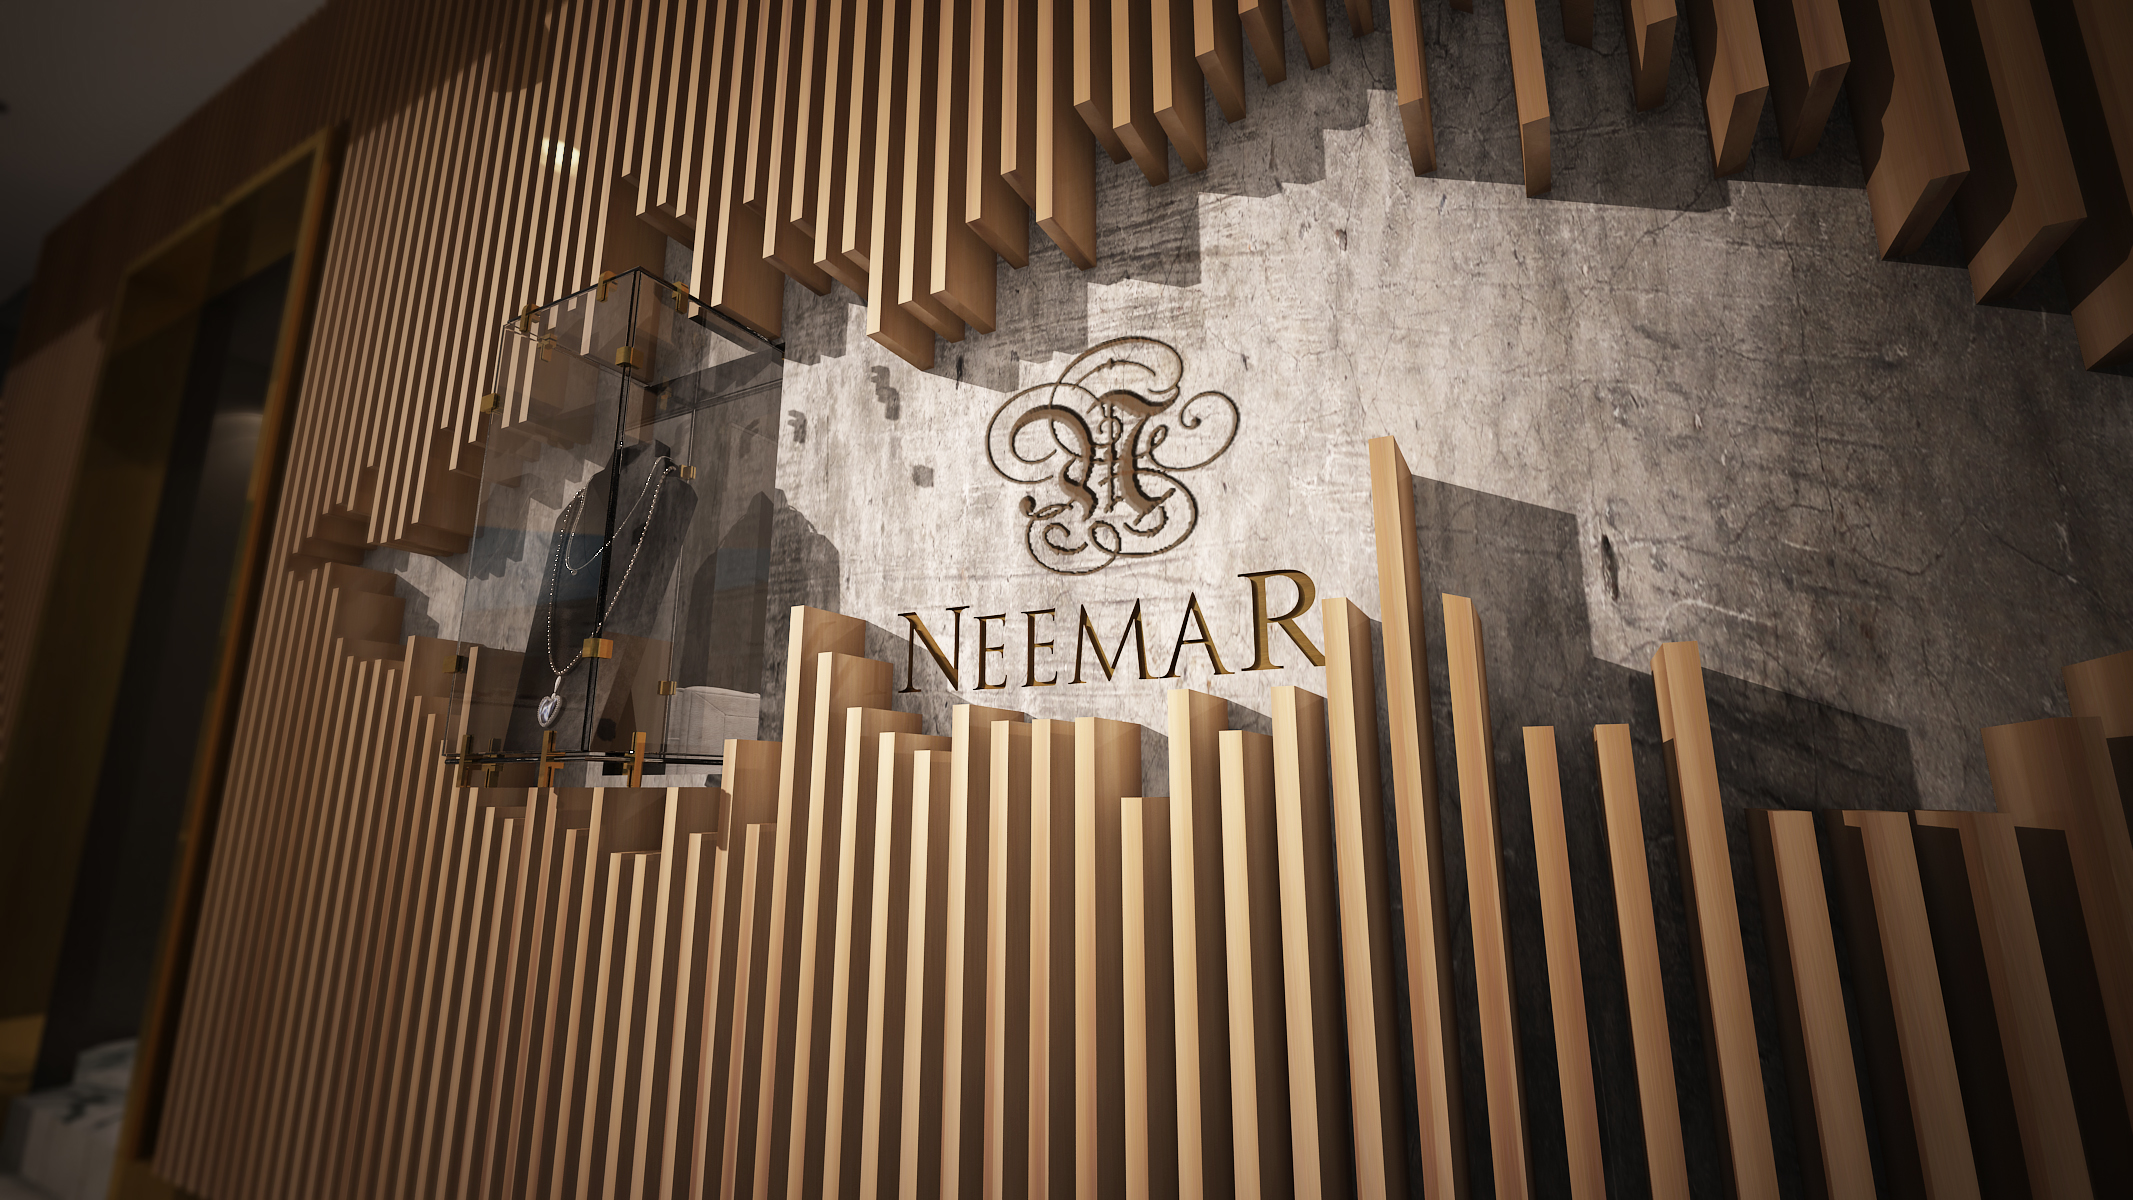 NEEMAR 02.jpg